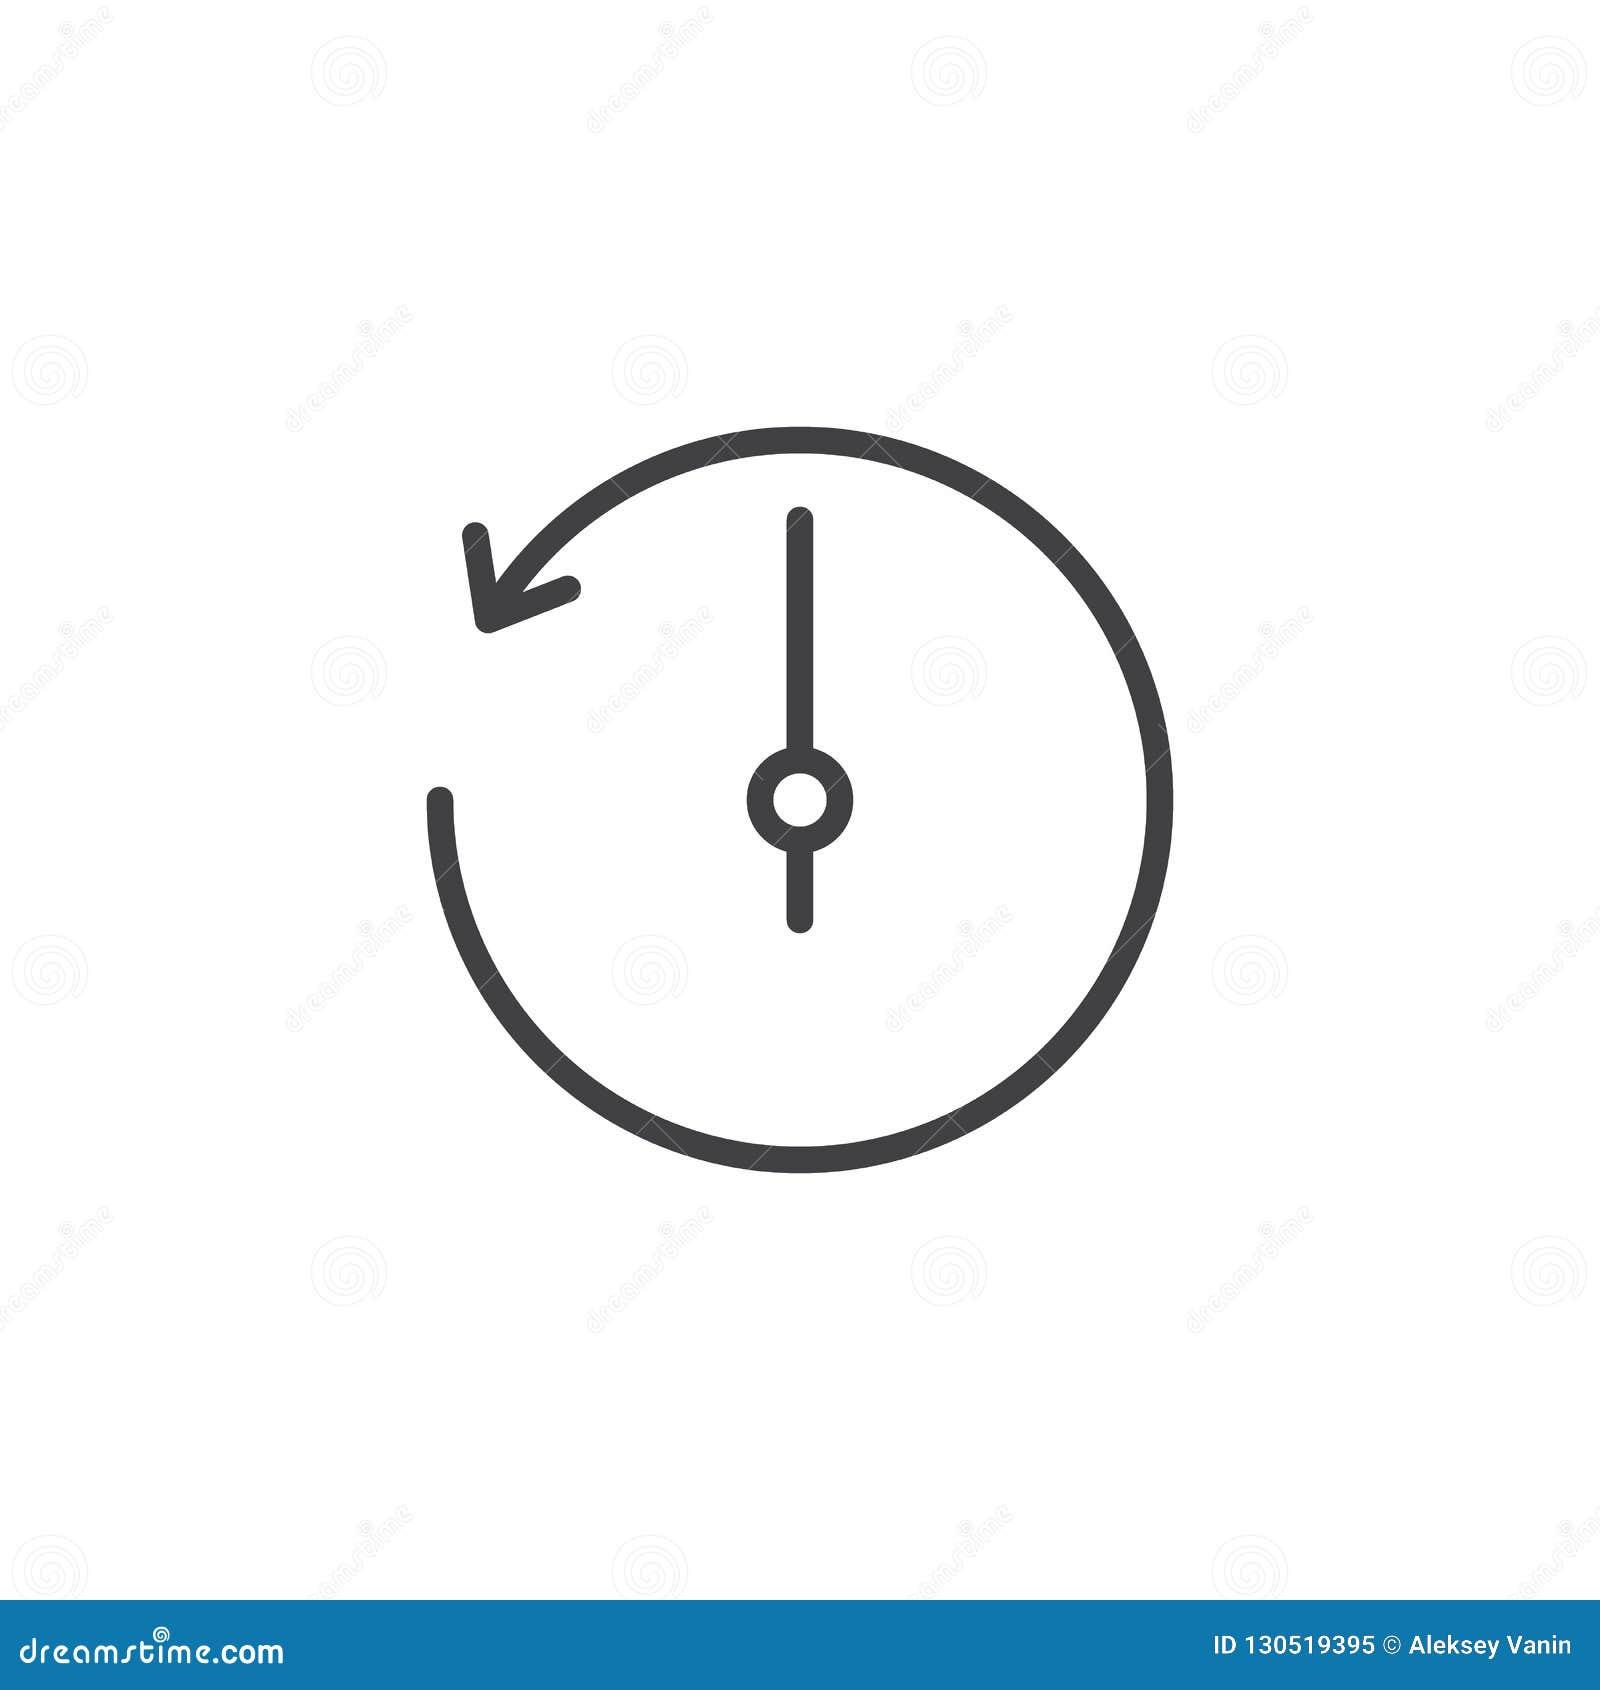 Counterclockwise Rotation Arrow Outline Icon Stock Vector ...